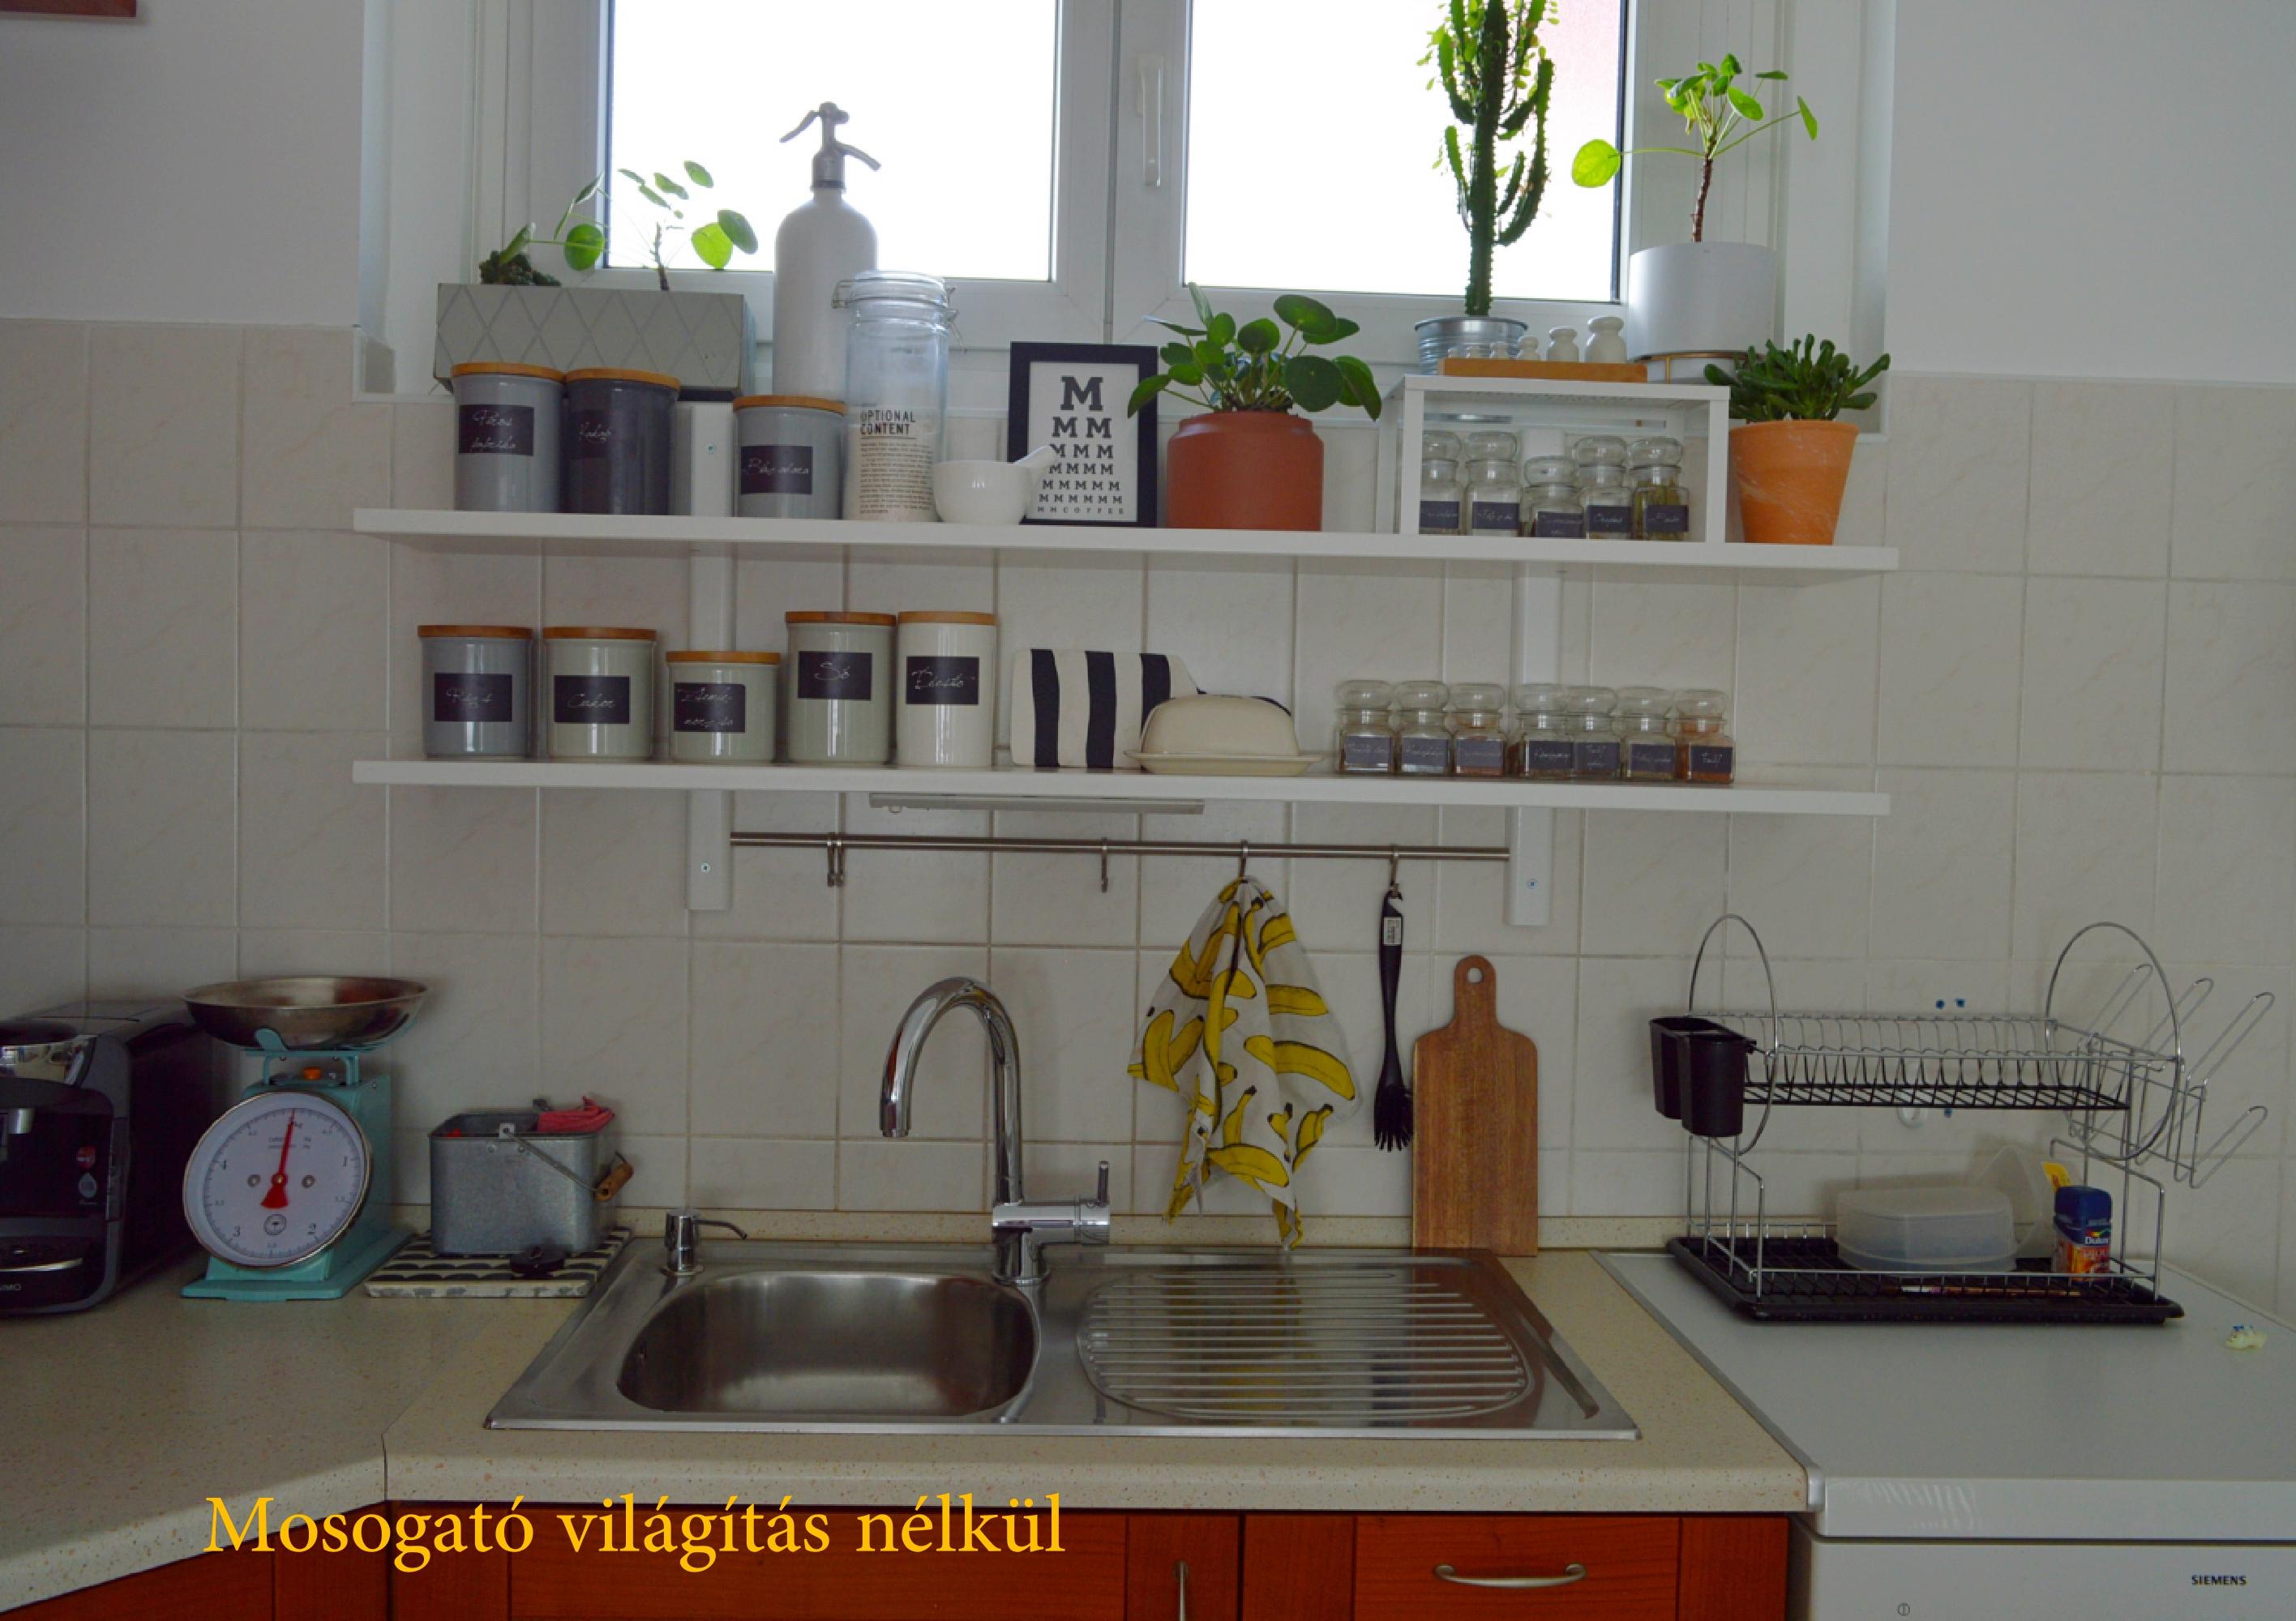 konyhai_vilagitas_utolag01.jpg